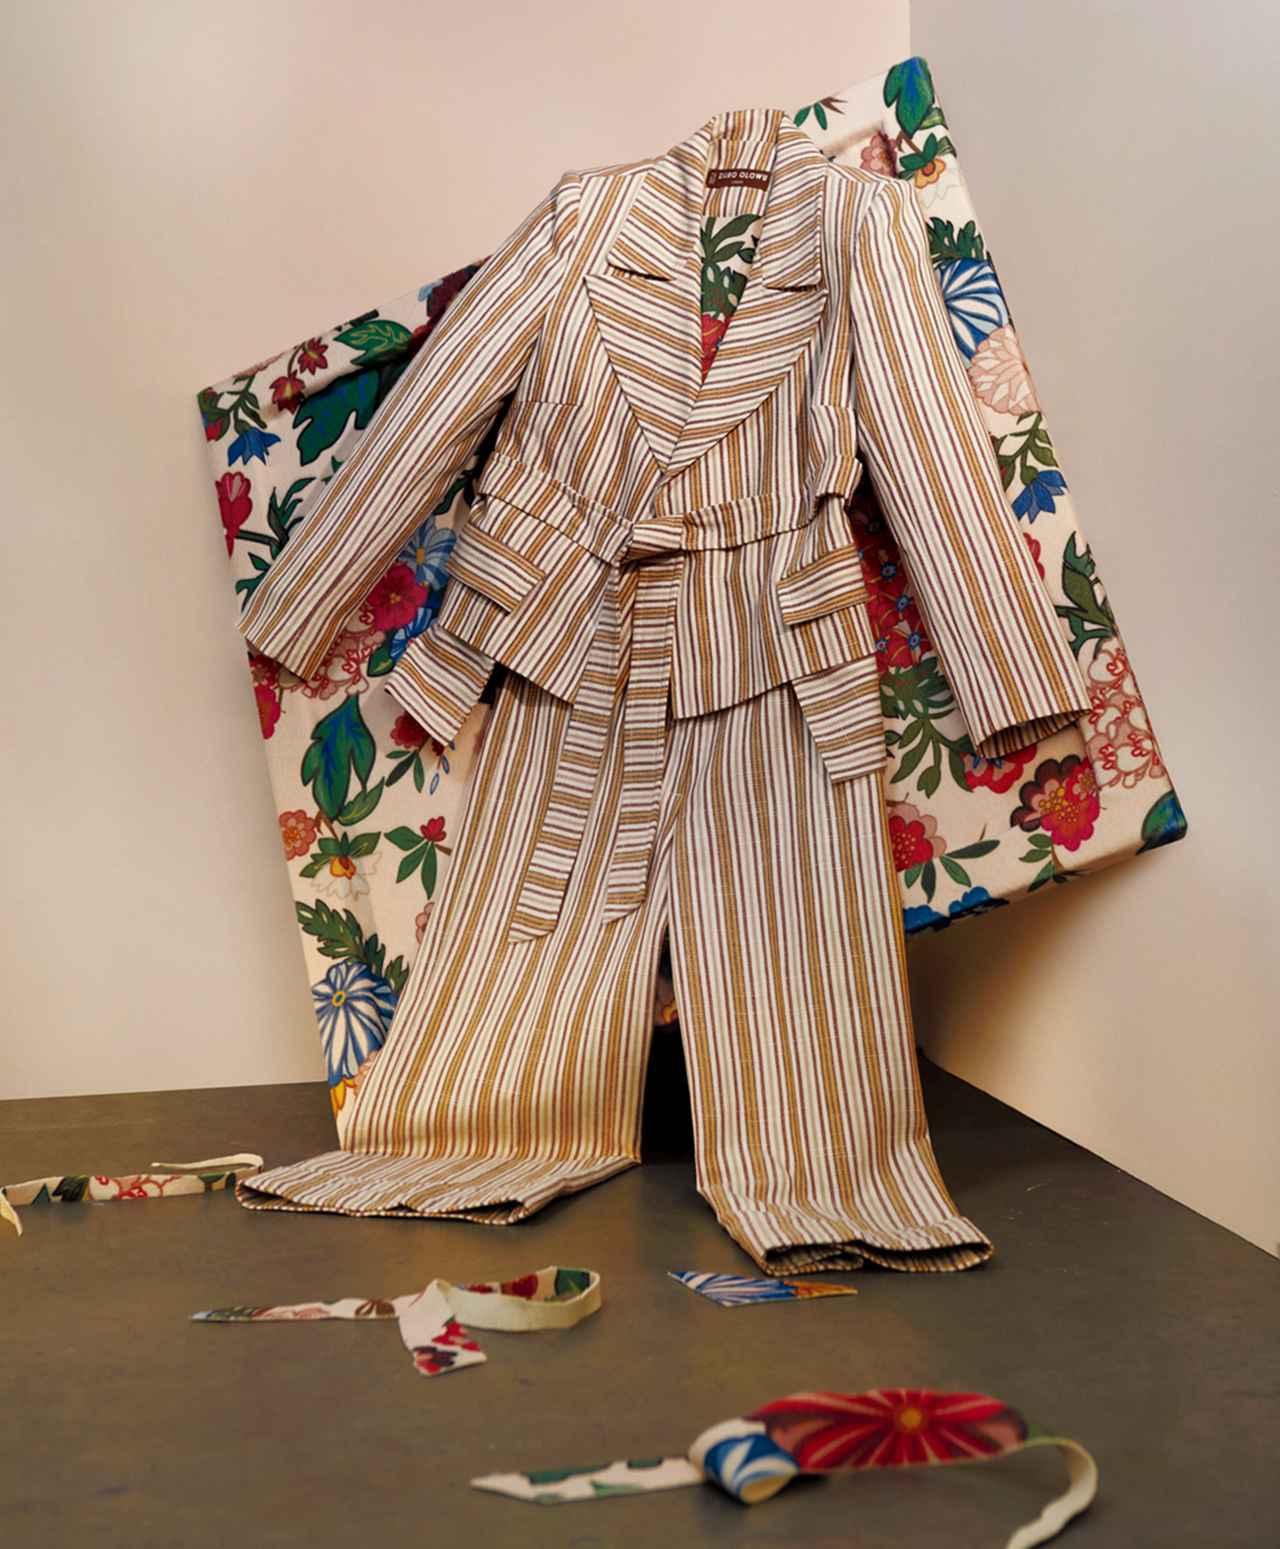 Images : 1番目の画像 - 「アートとジェンダーの関係」のアルバム - T JAPAN:The New York Times Style Magazine 公式サイト